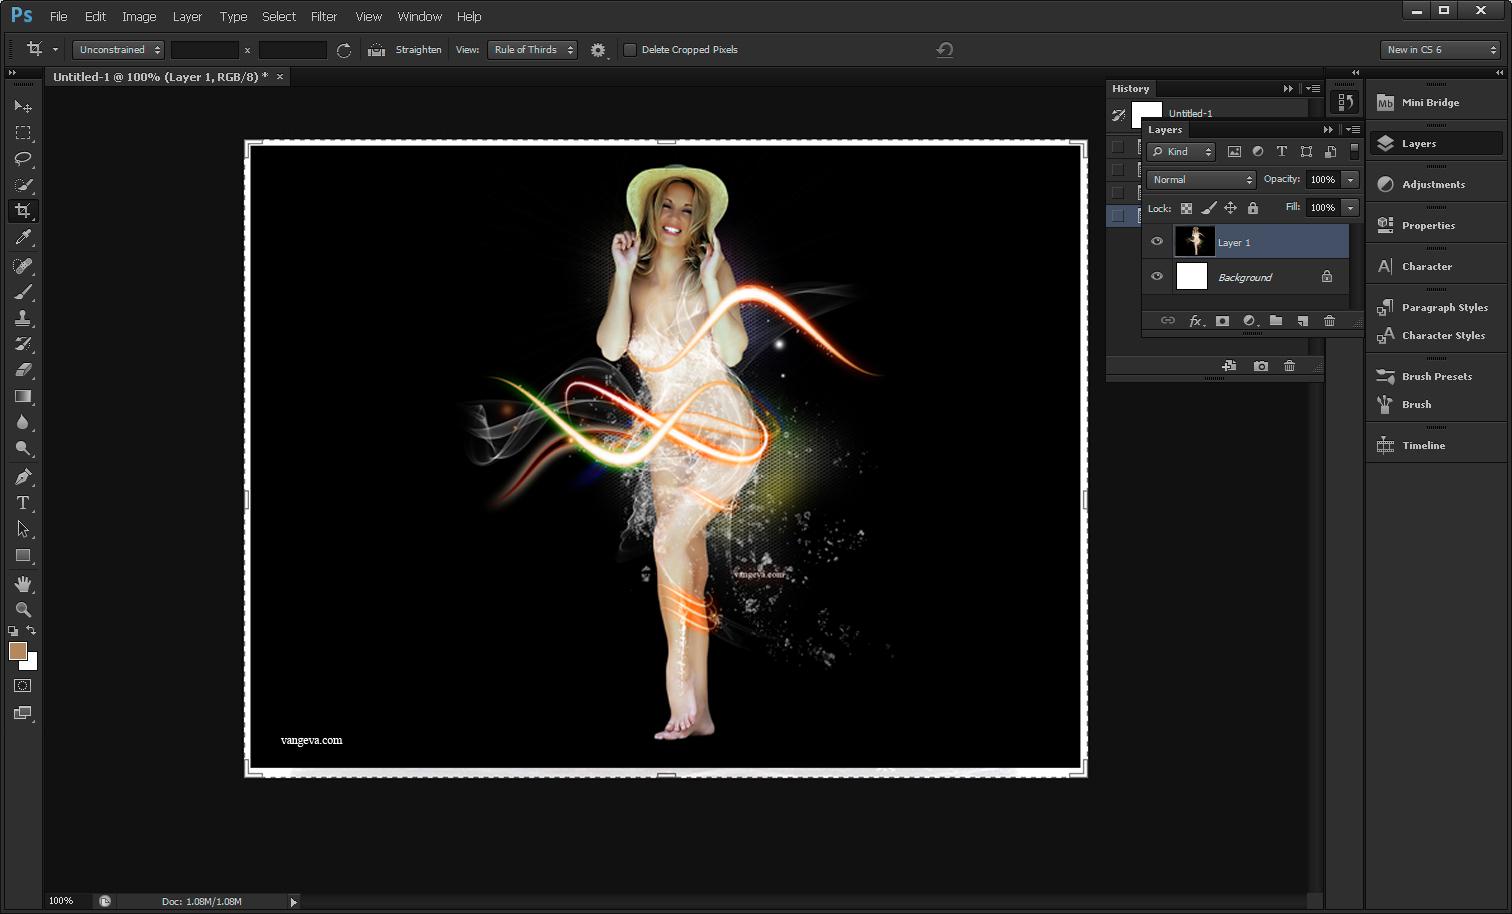 Adobe Photoshop CS6 New Features